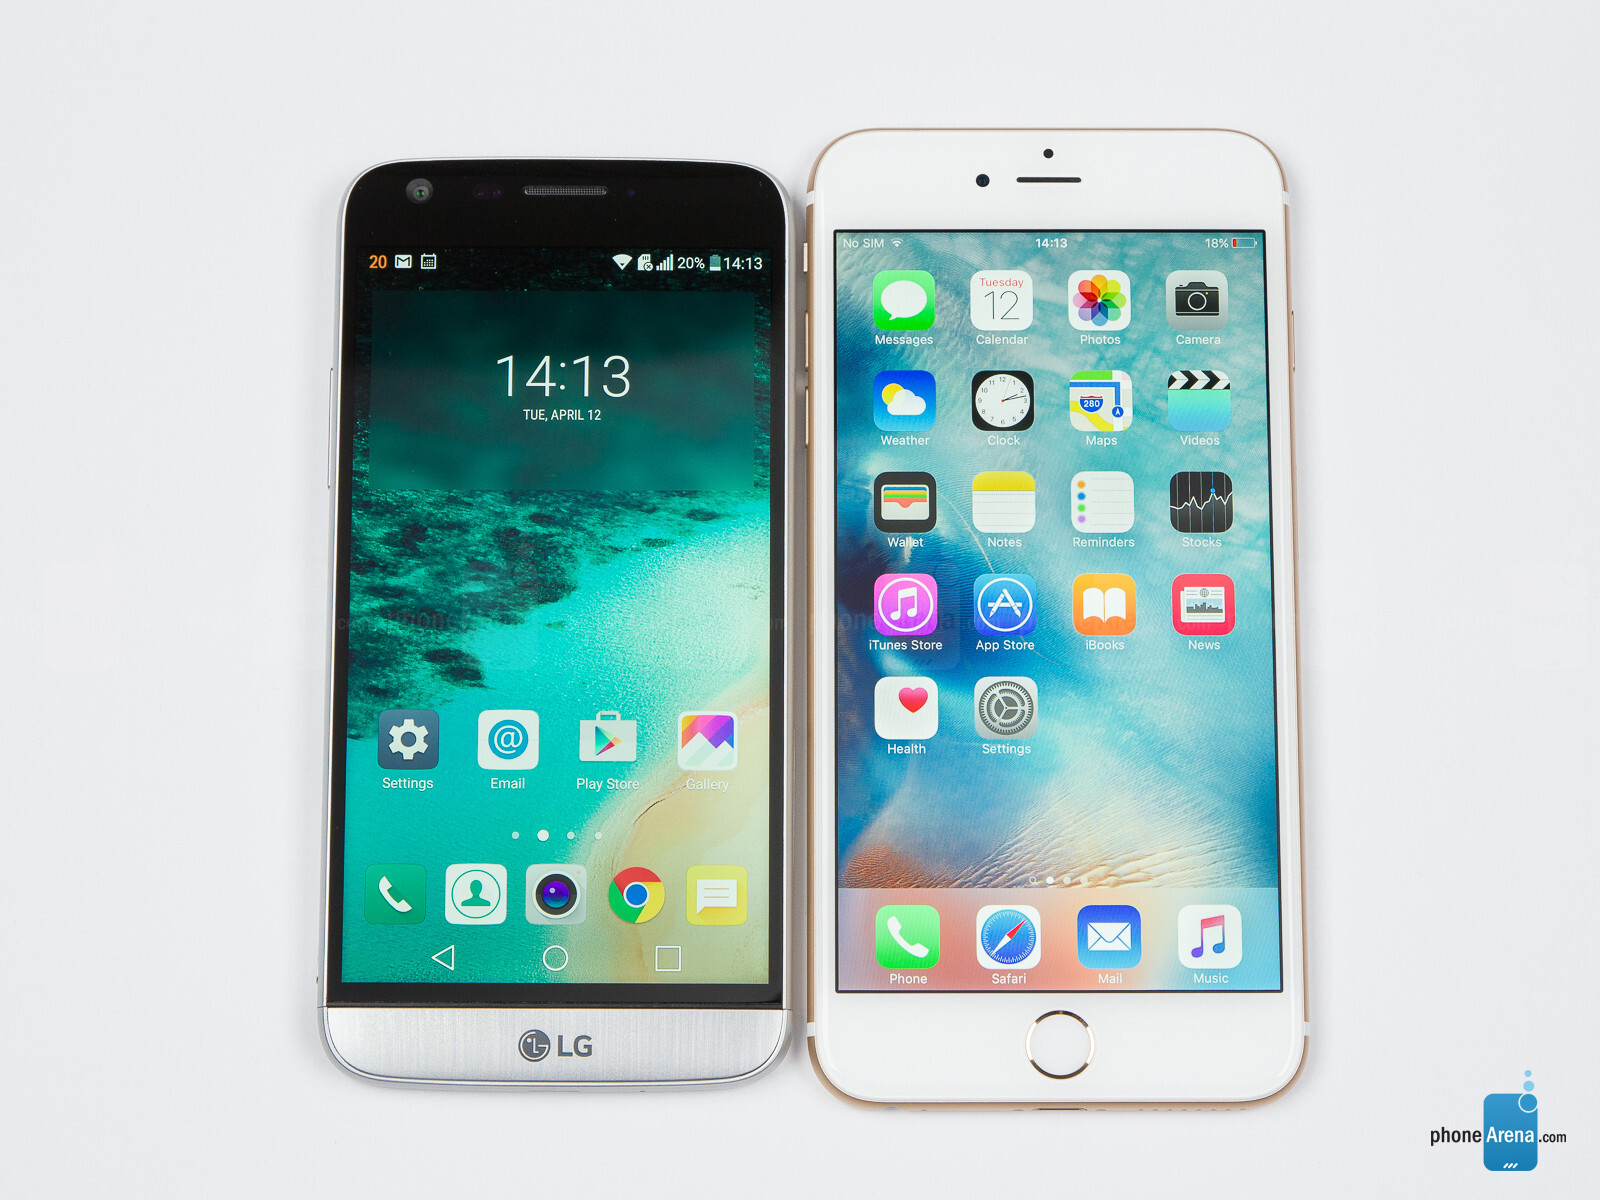 LG G5 vs Apple iPhone 6s Plus - PhoneArena